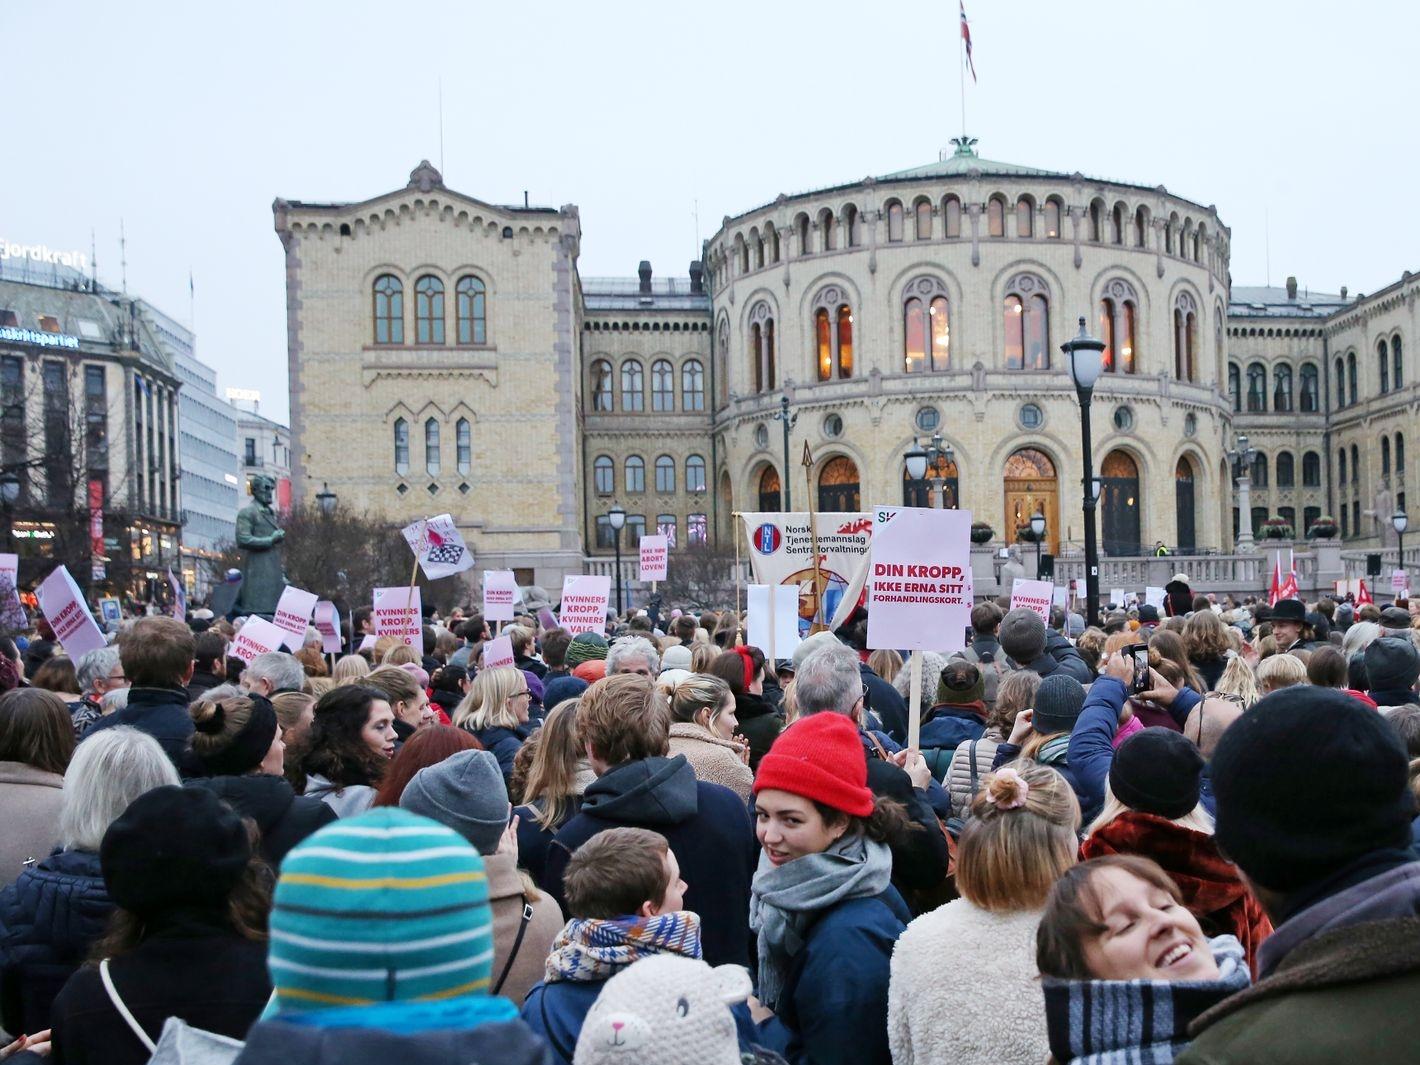 Foto: Trond Solberg / VG